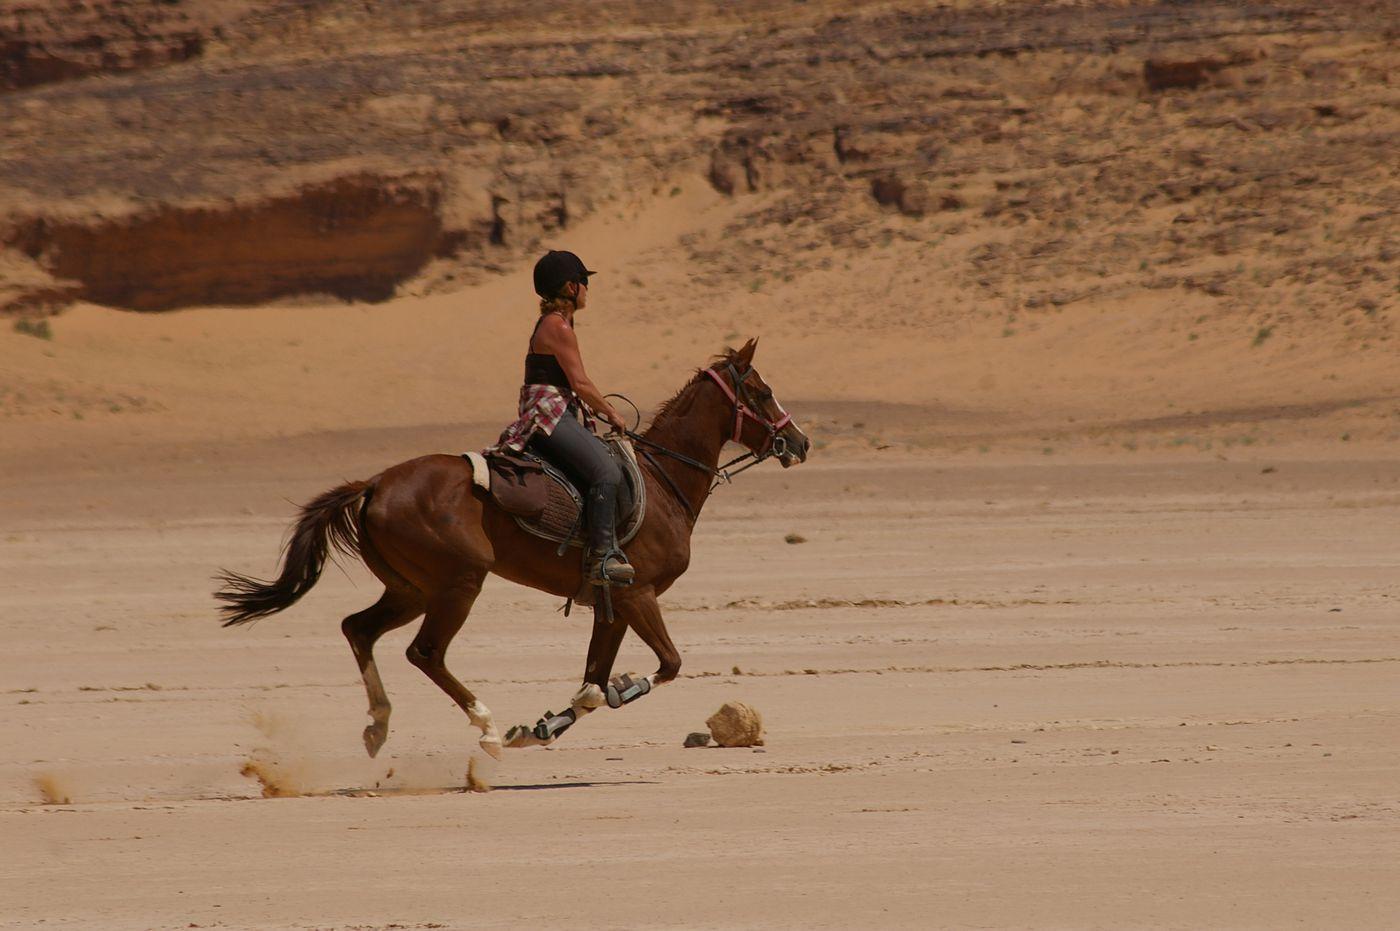 Petra to Wadi Rum Trail (10 Day) itinerary.